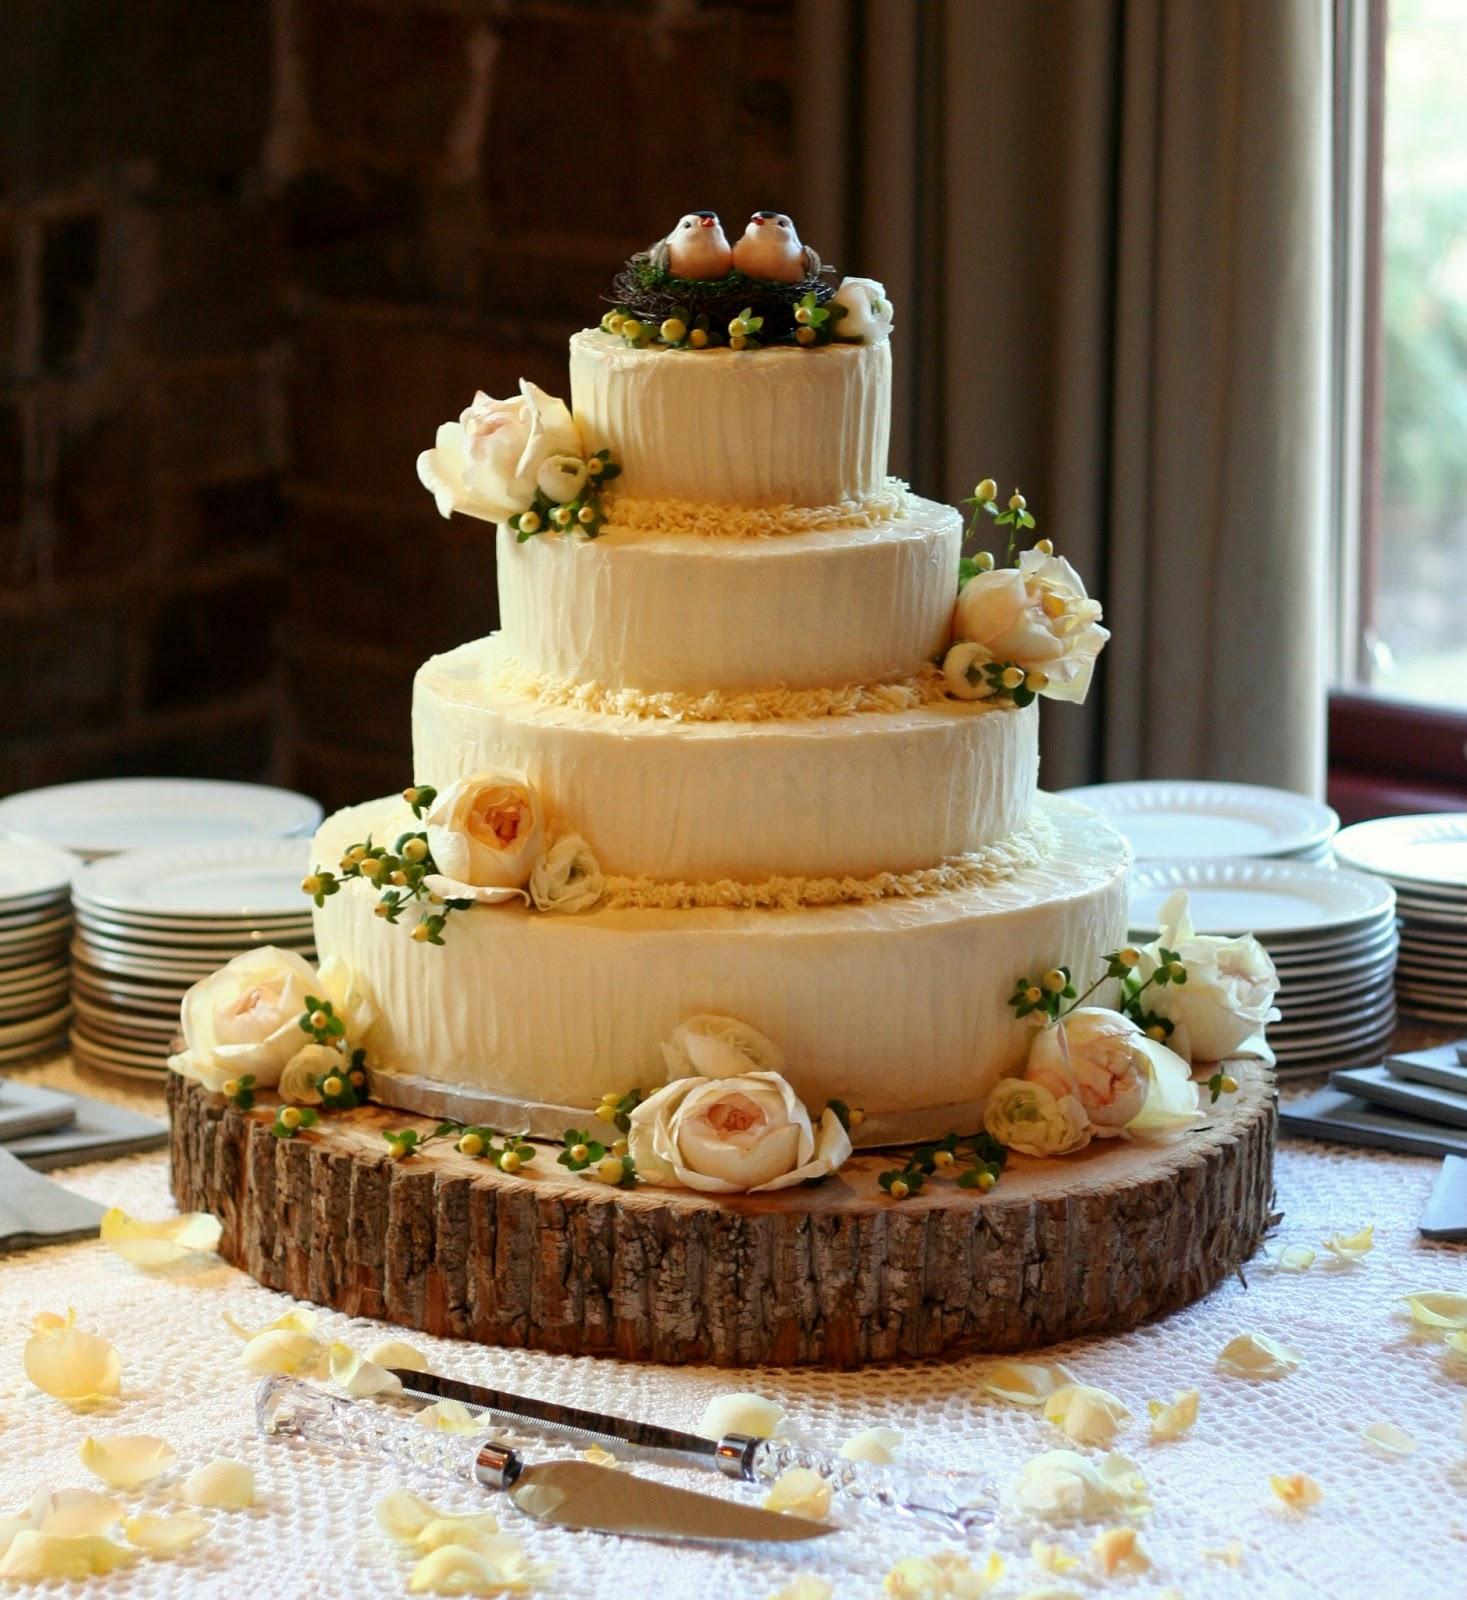 6 Stunning Rustic Wedding Cake Ideas - Wedding Cakes